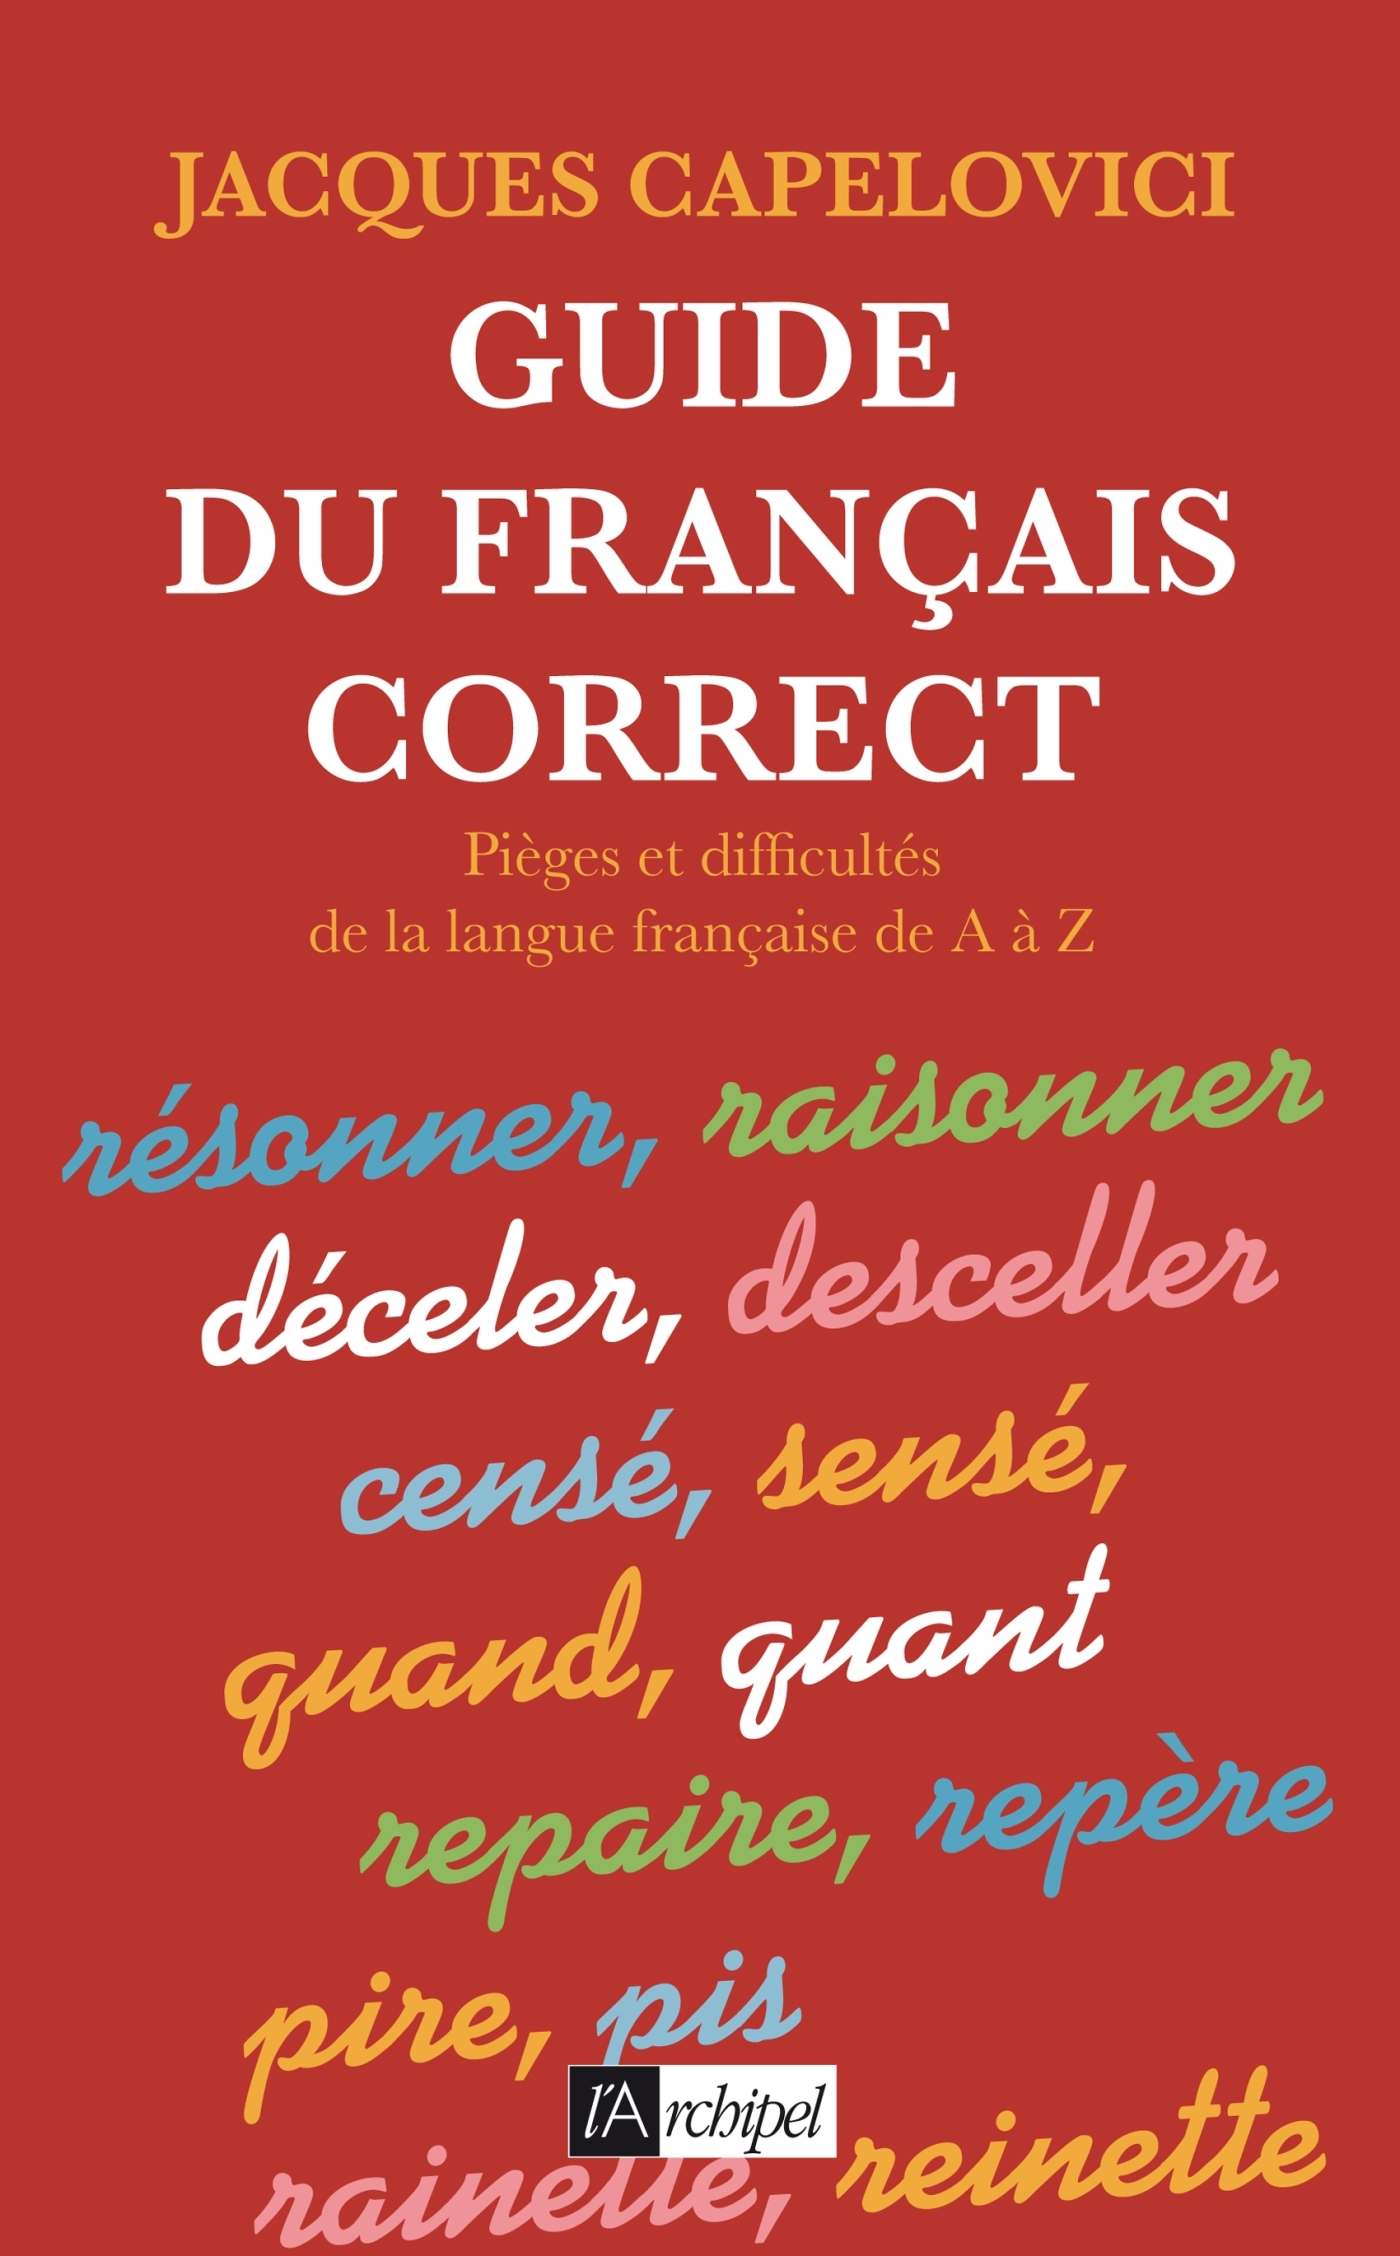 GUIDE DU FRANCAIS CORRECT